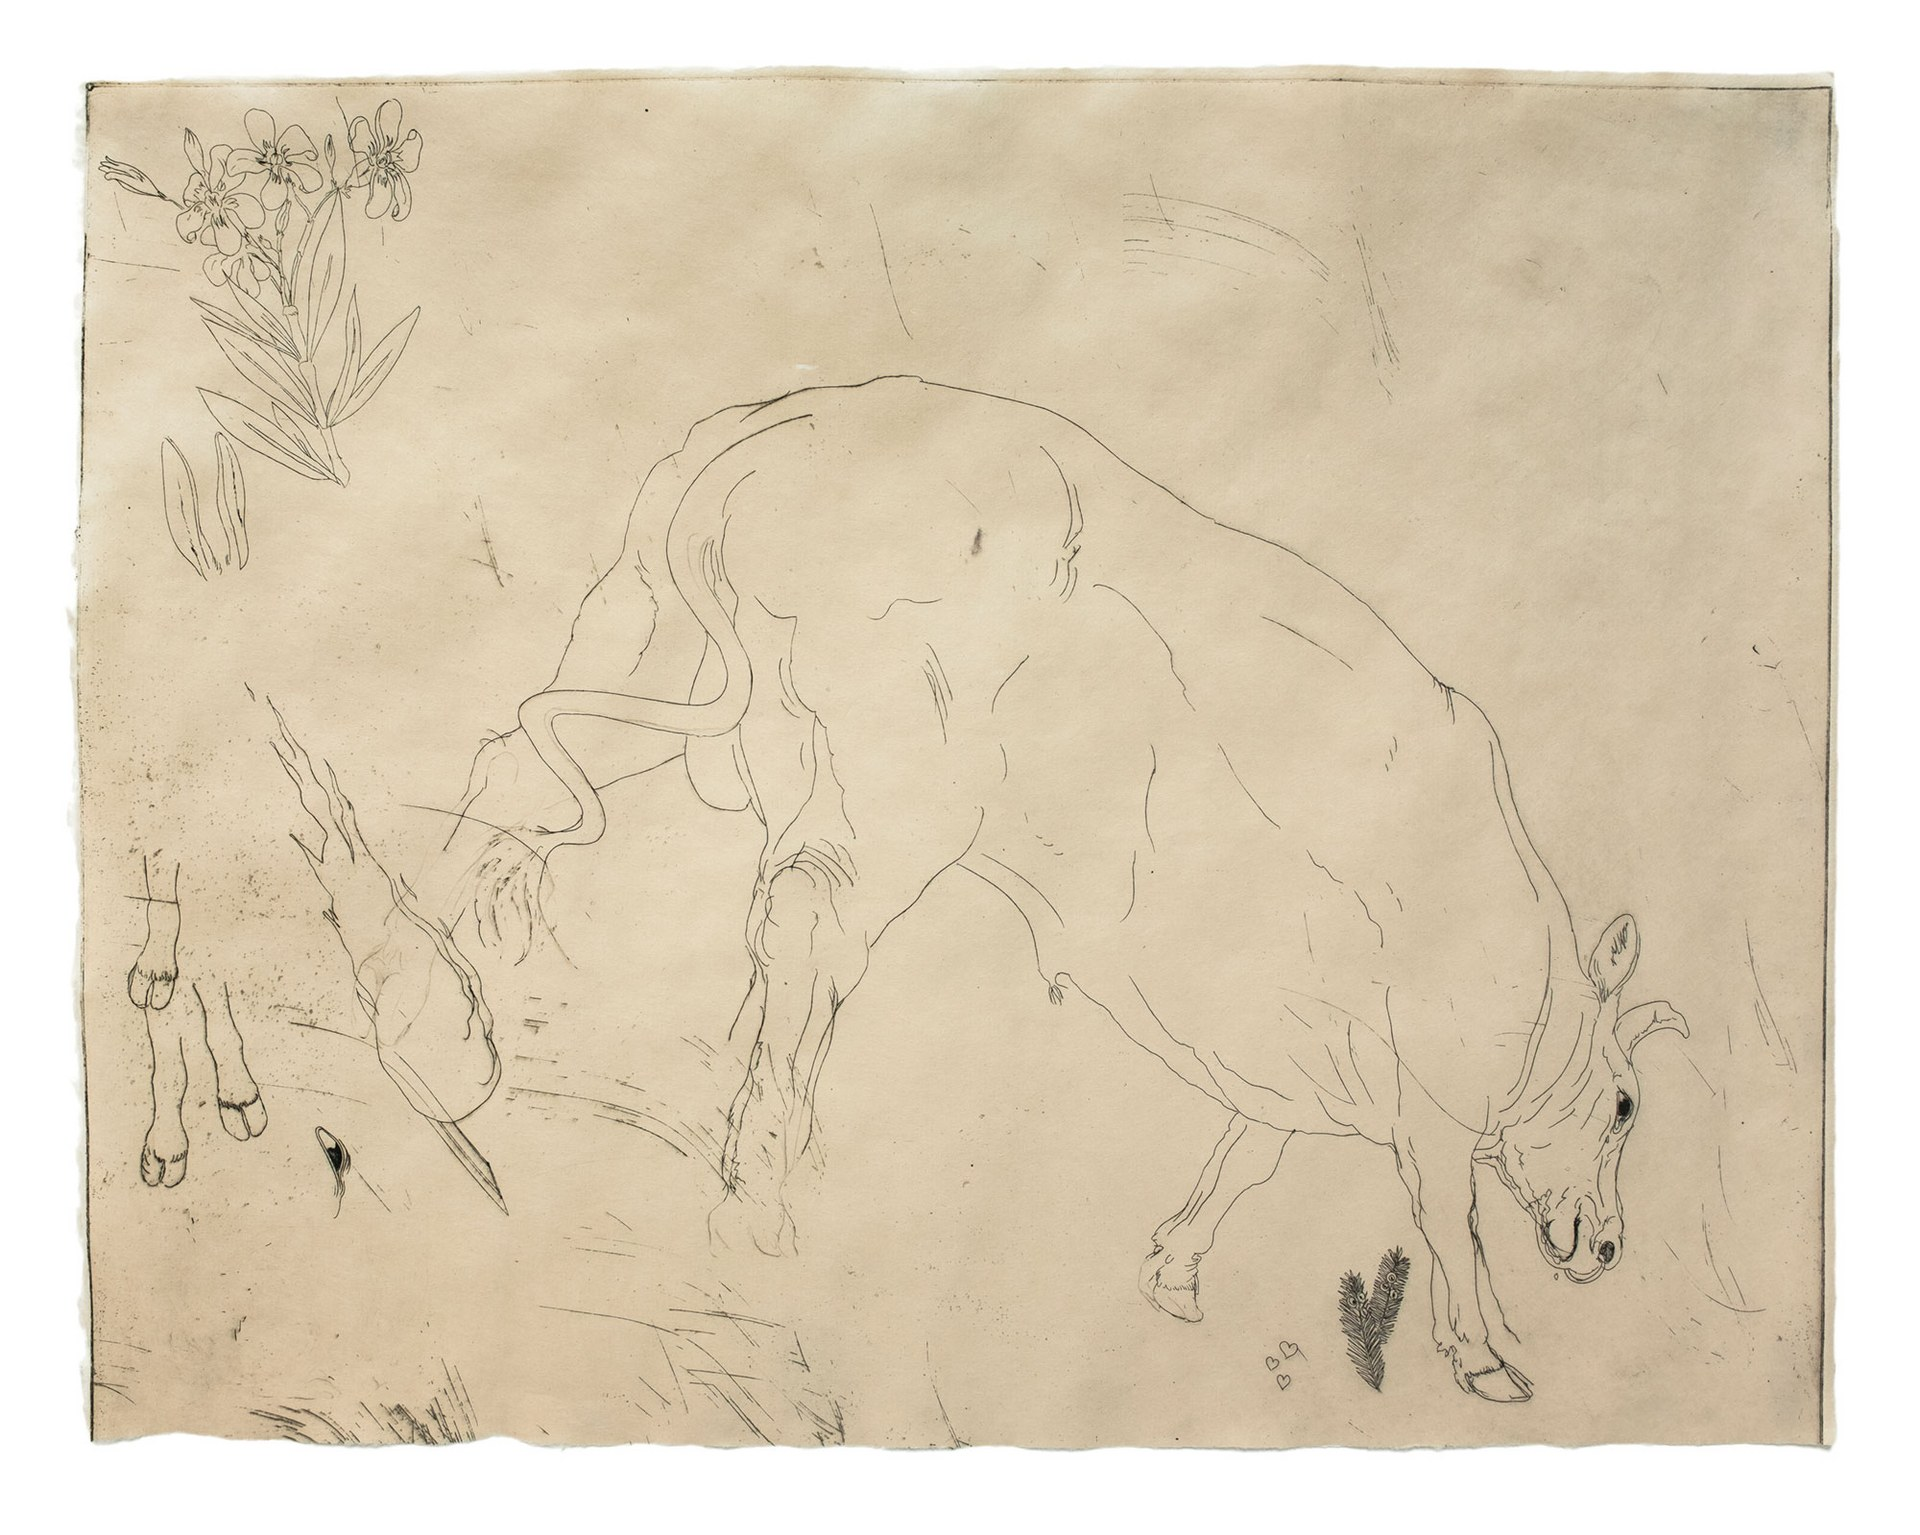 taxus, oleander, bunny, bull & 3 hearts, uwu